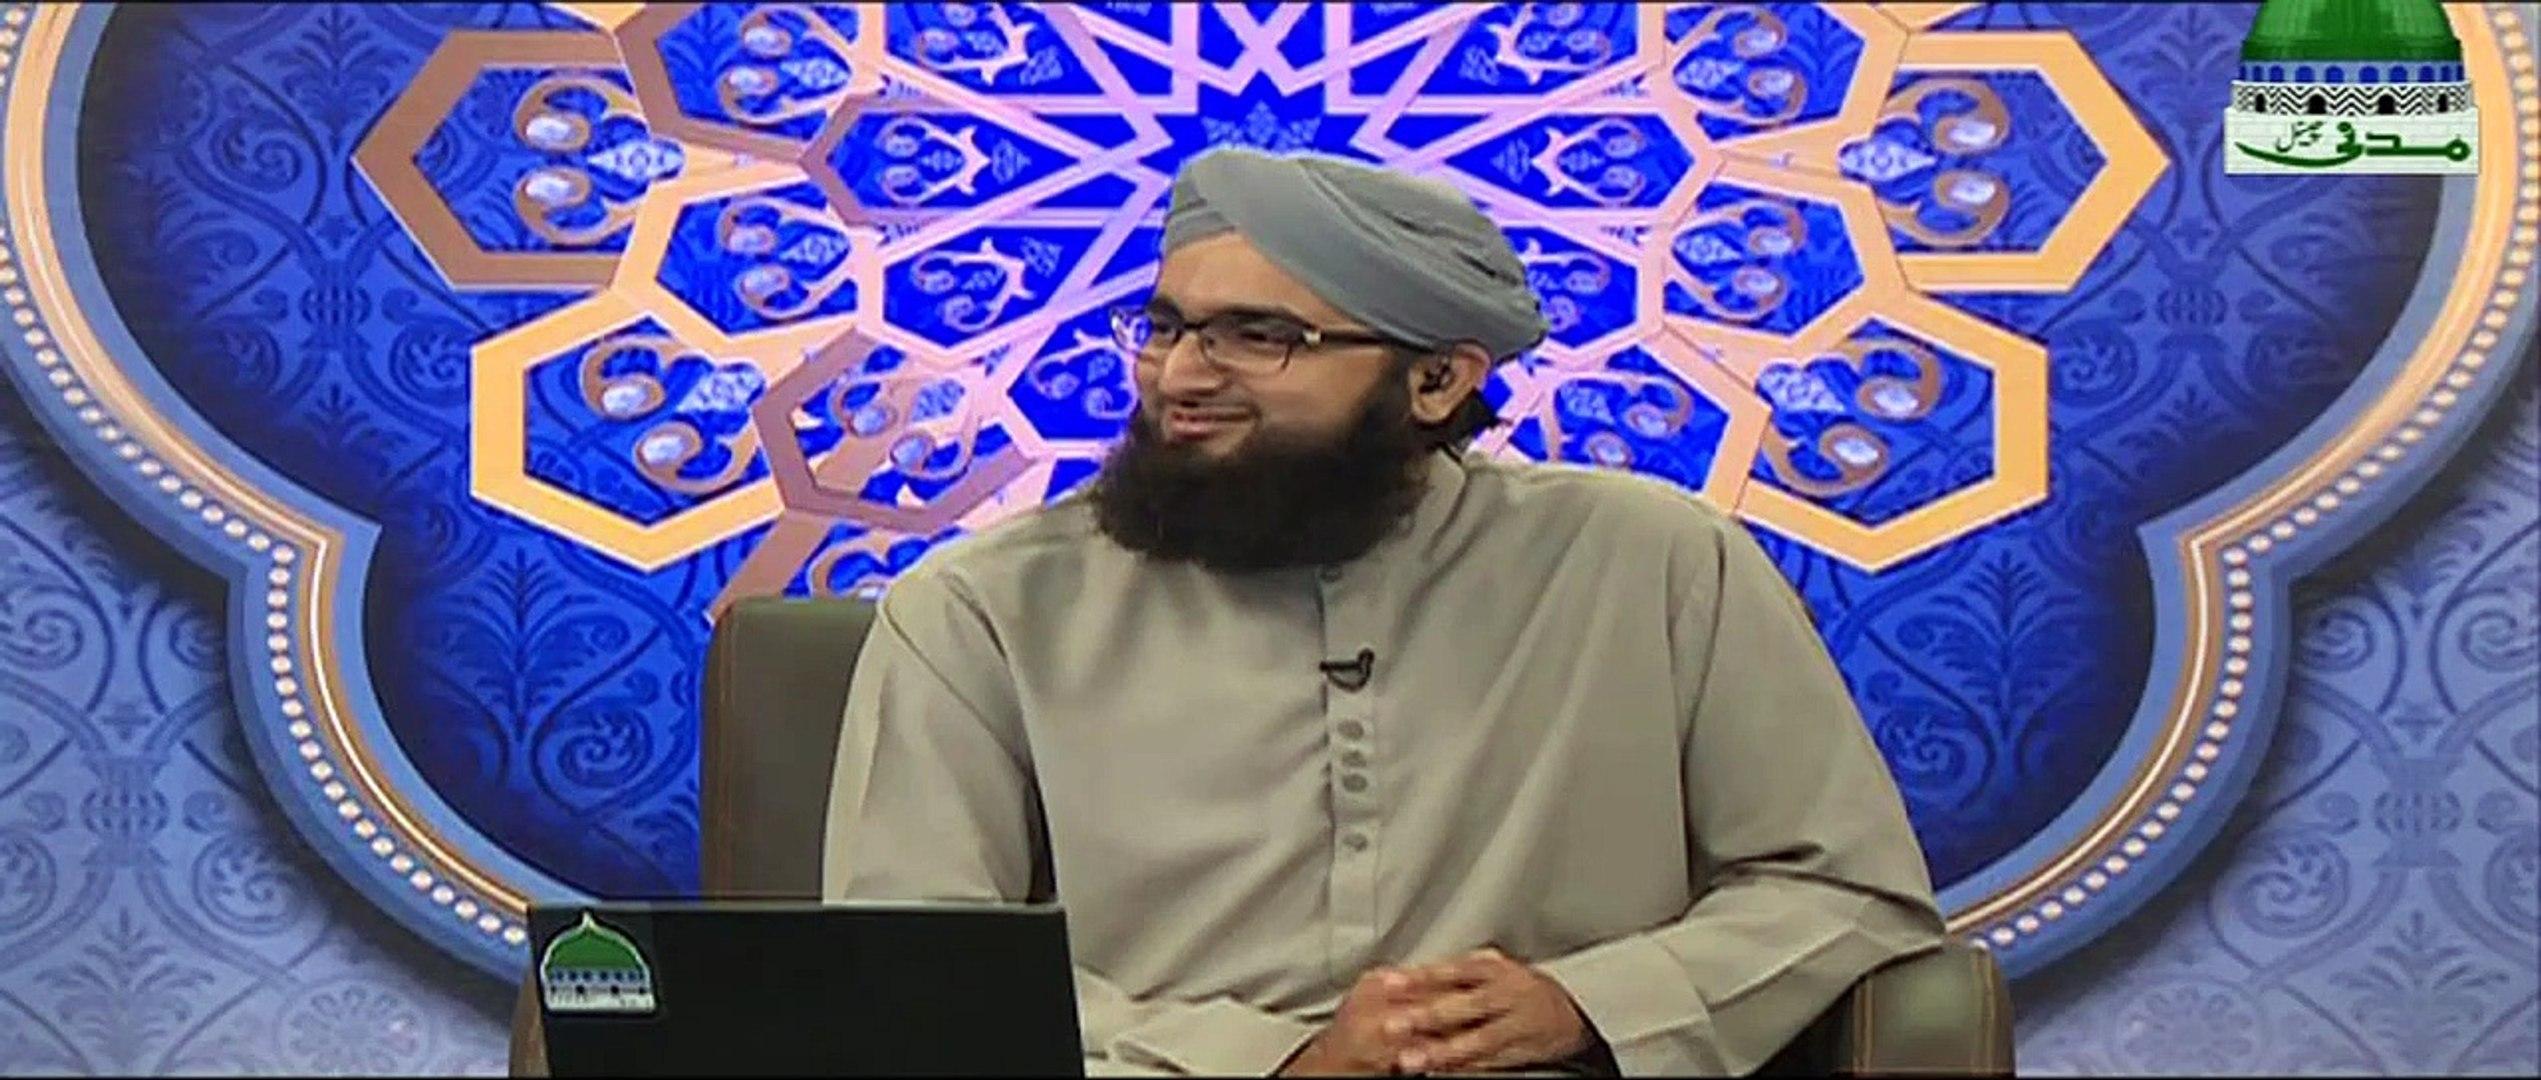 Abdul Habib Attari (زندگی کی خواہشات کسی ہونی چاہیے) The wishes of life must be one.